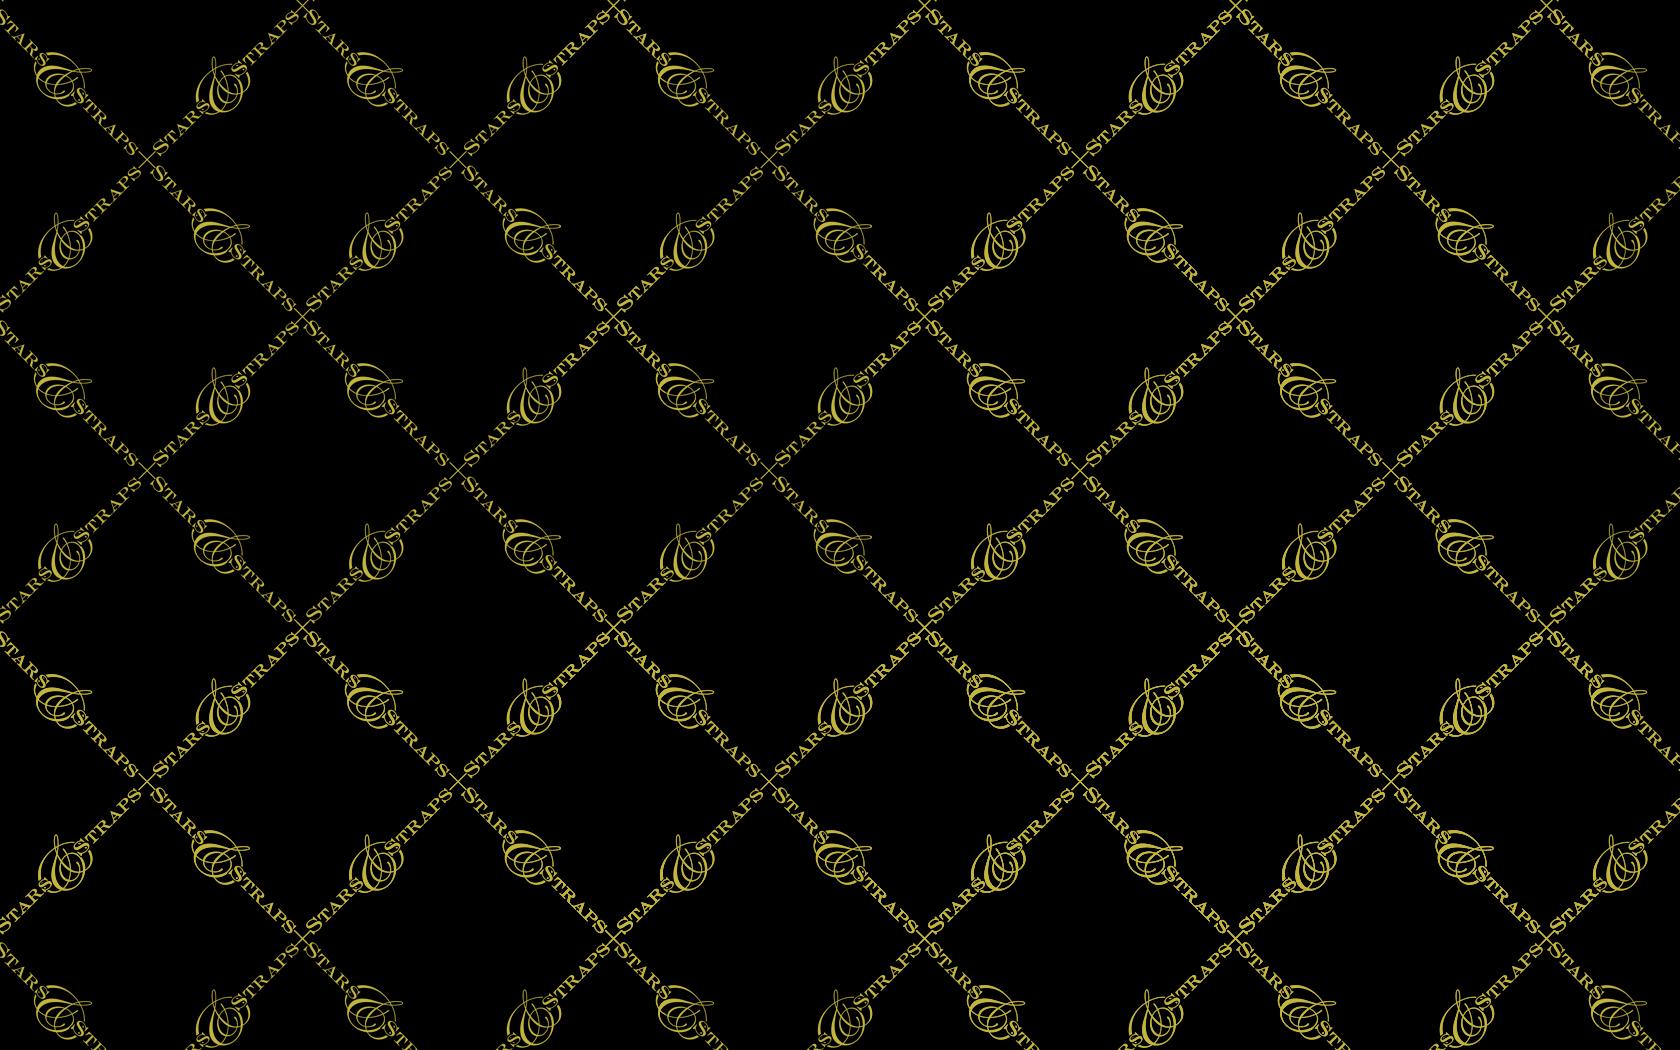 Black Gold Wallpaper Cool HD Wallpapers 1680x1050